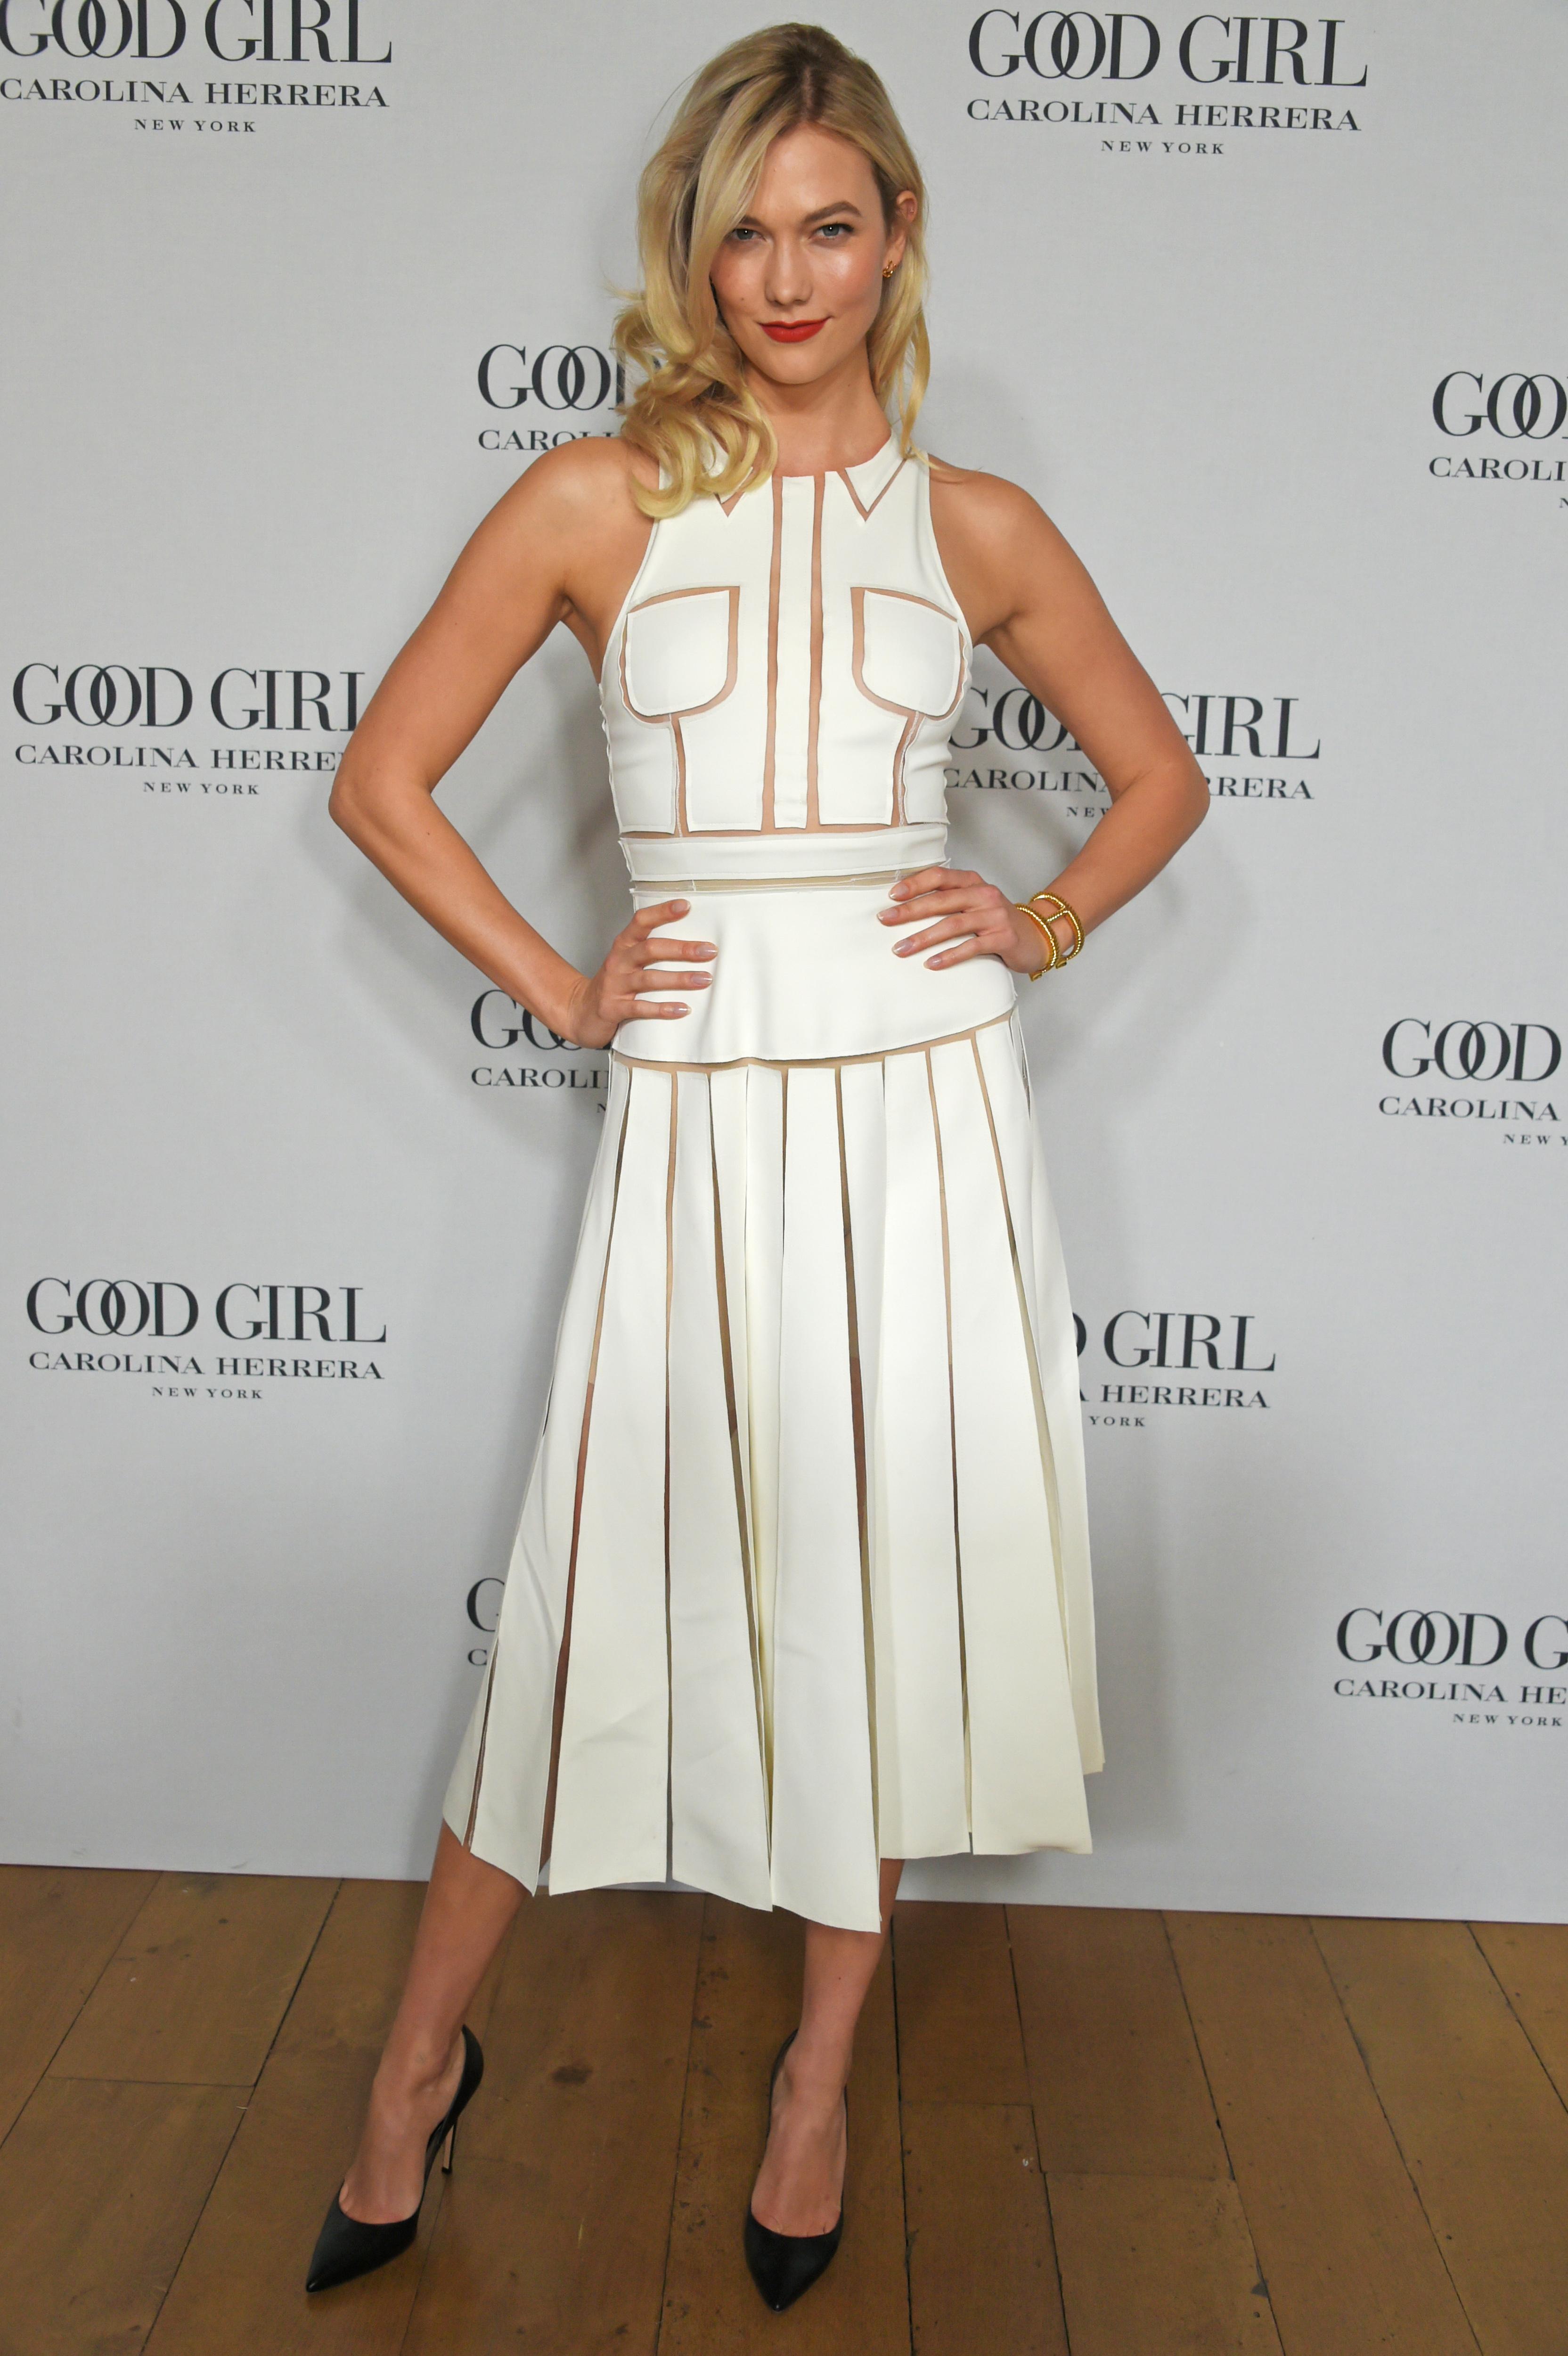 "Carolina Herrera Launches New Fragrance ""Good Girl"" With Karlie Kloss In London"